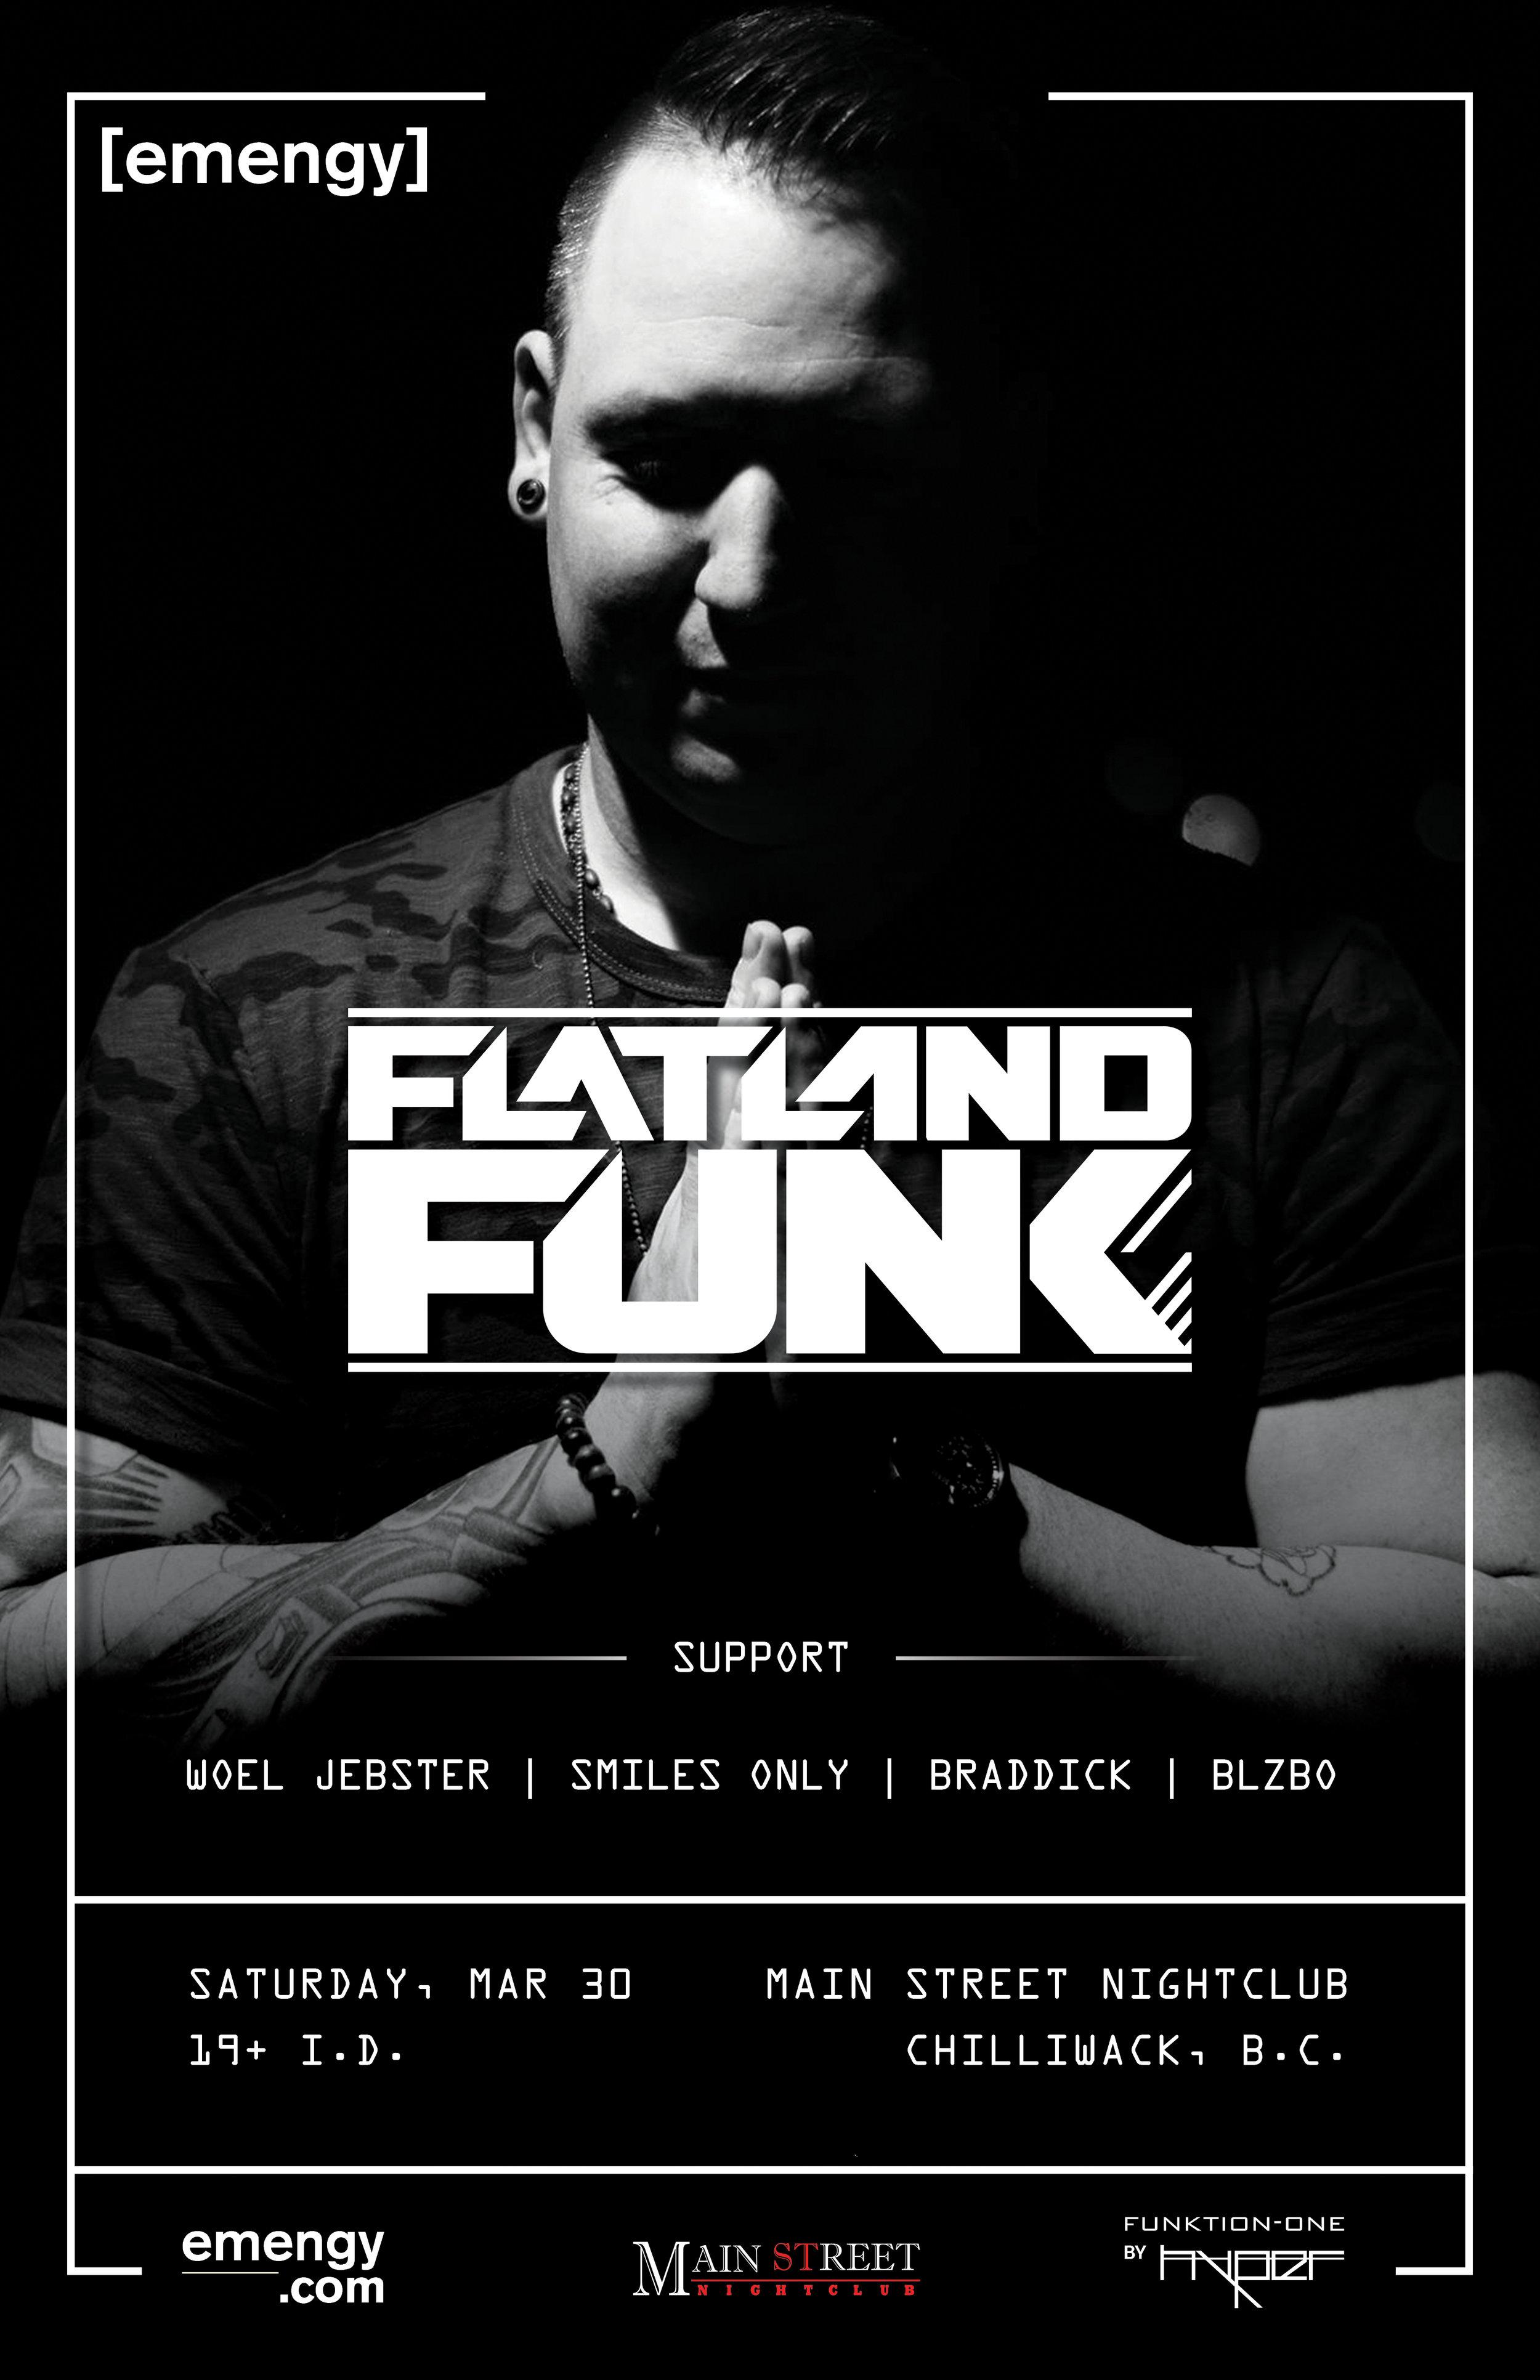 EMENGY - Flatland Funk (Poster - No Bleeds - For Web).jpg